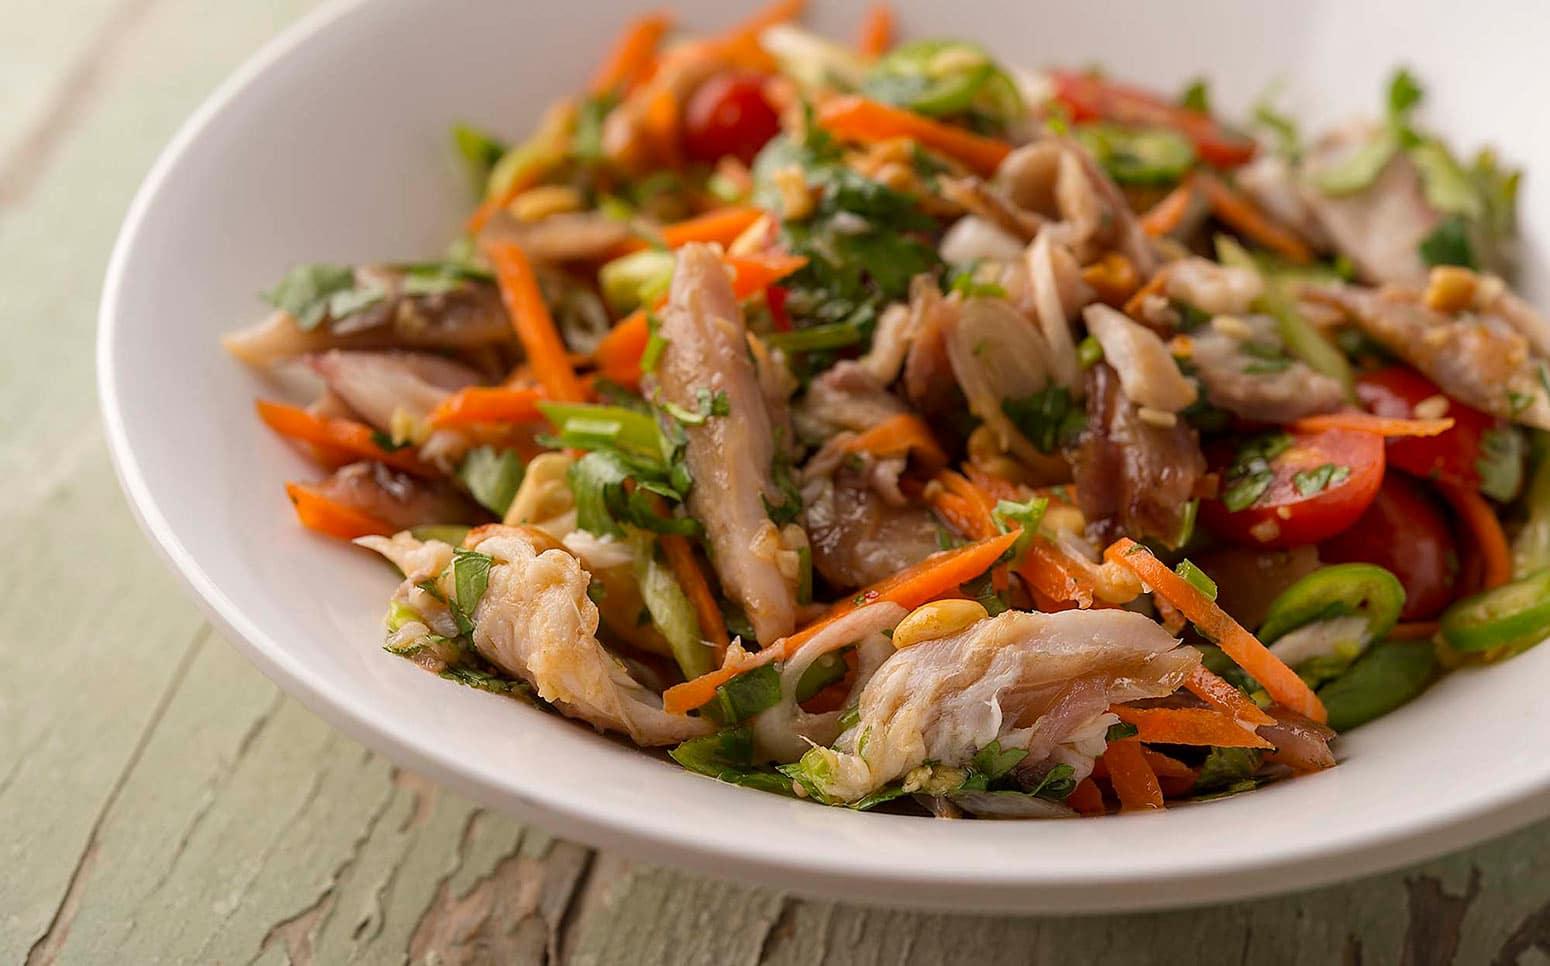 Vietnamese smoked fish salad